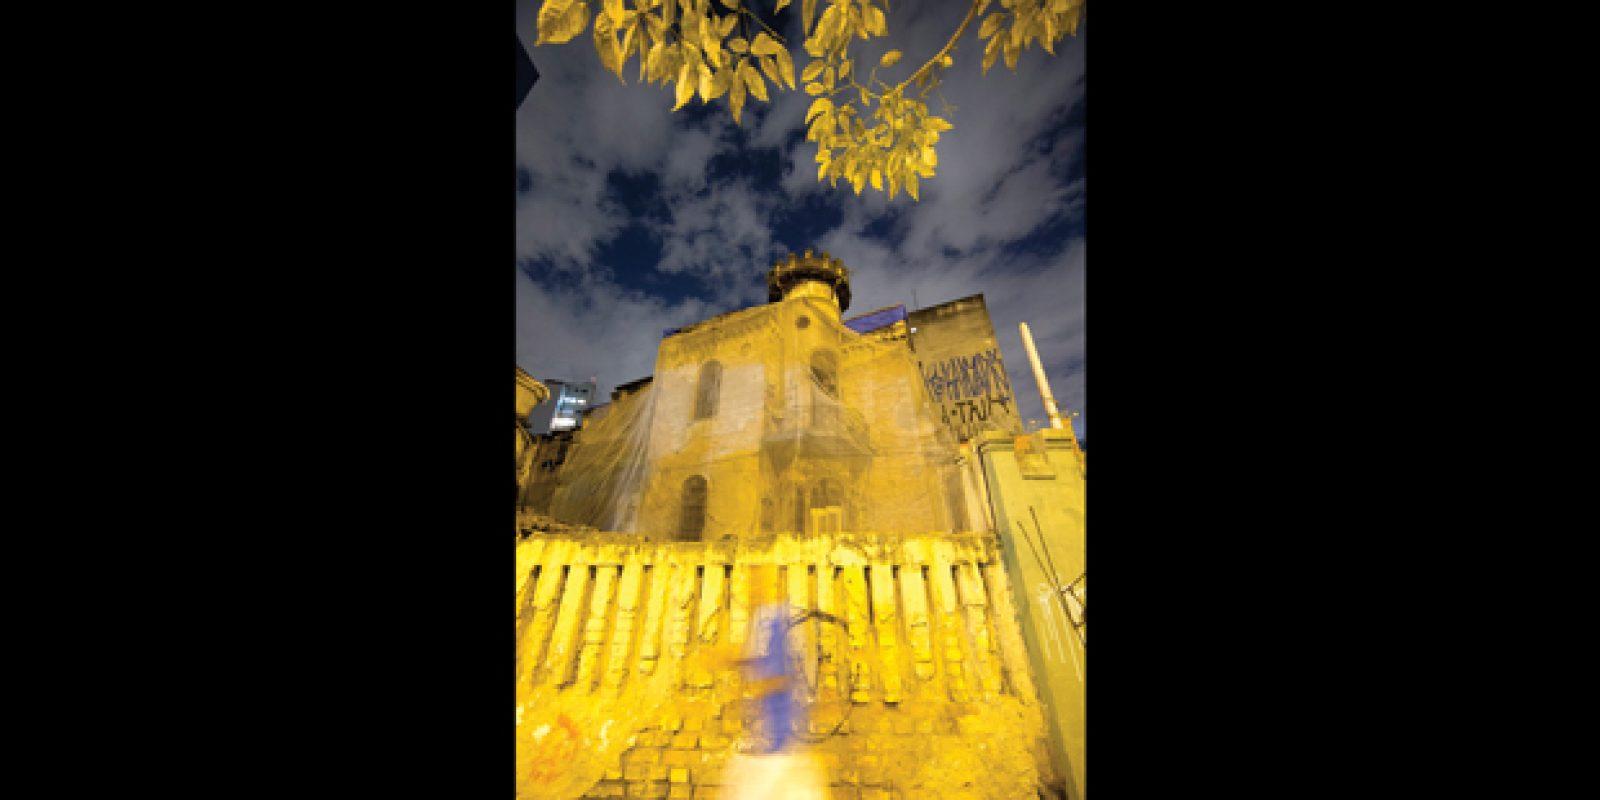 Castelinhorua